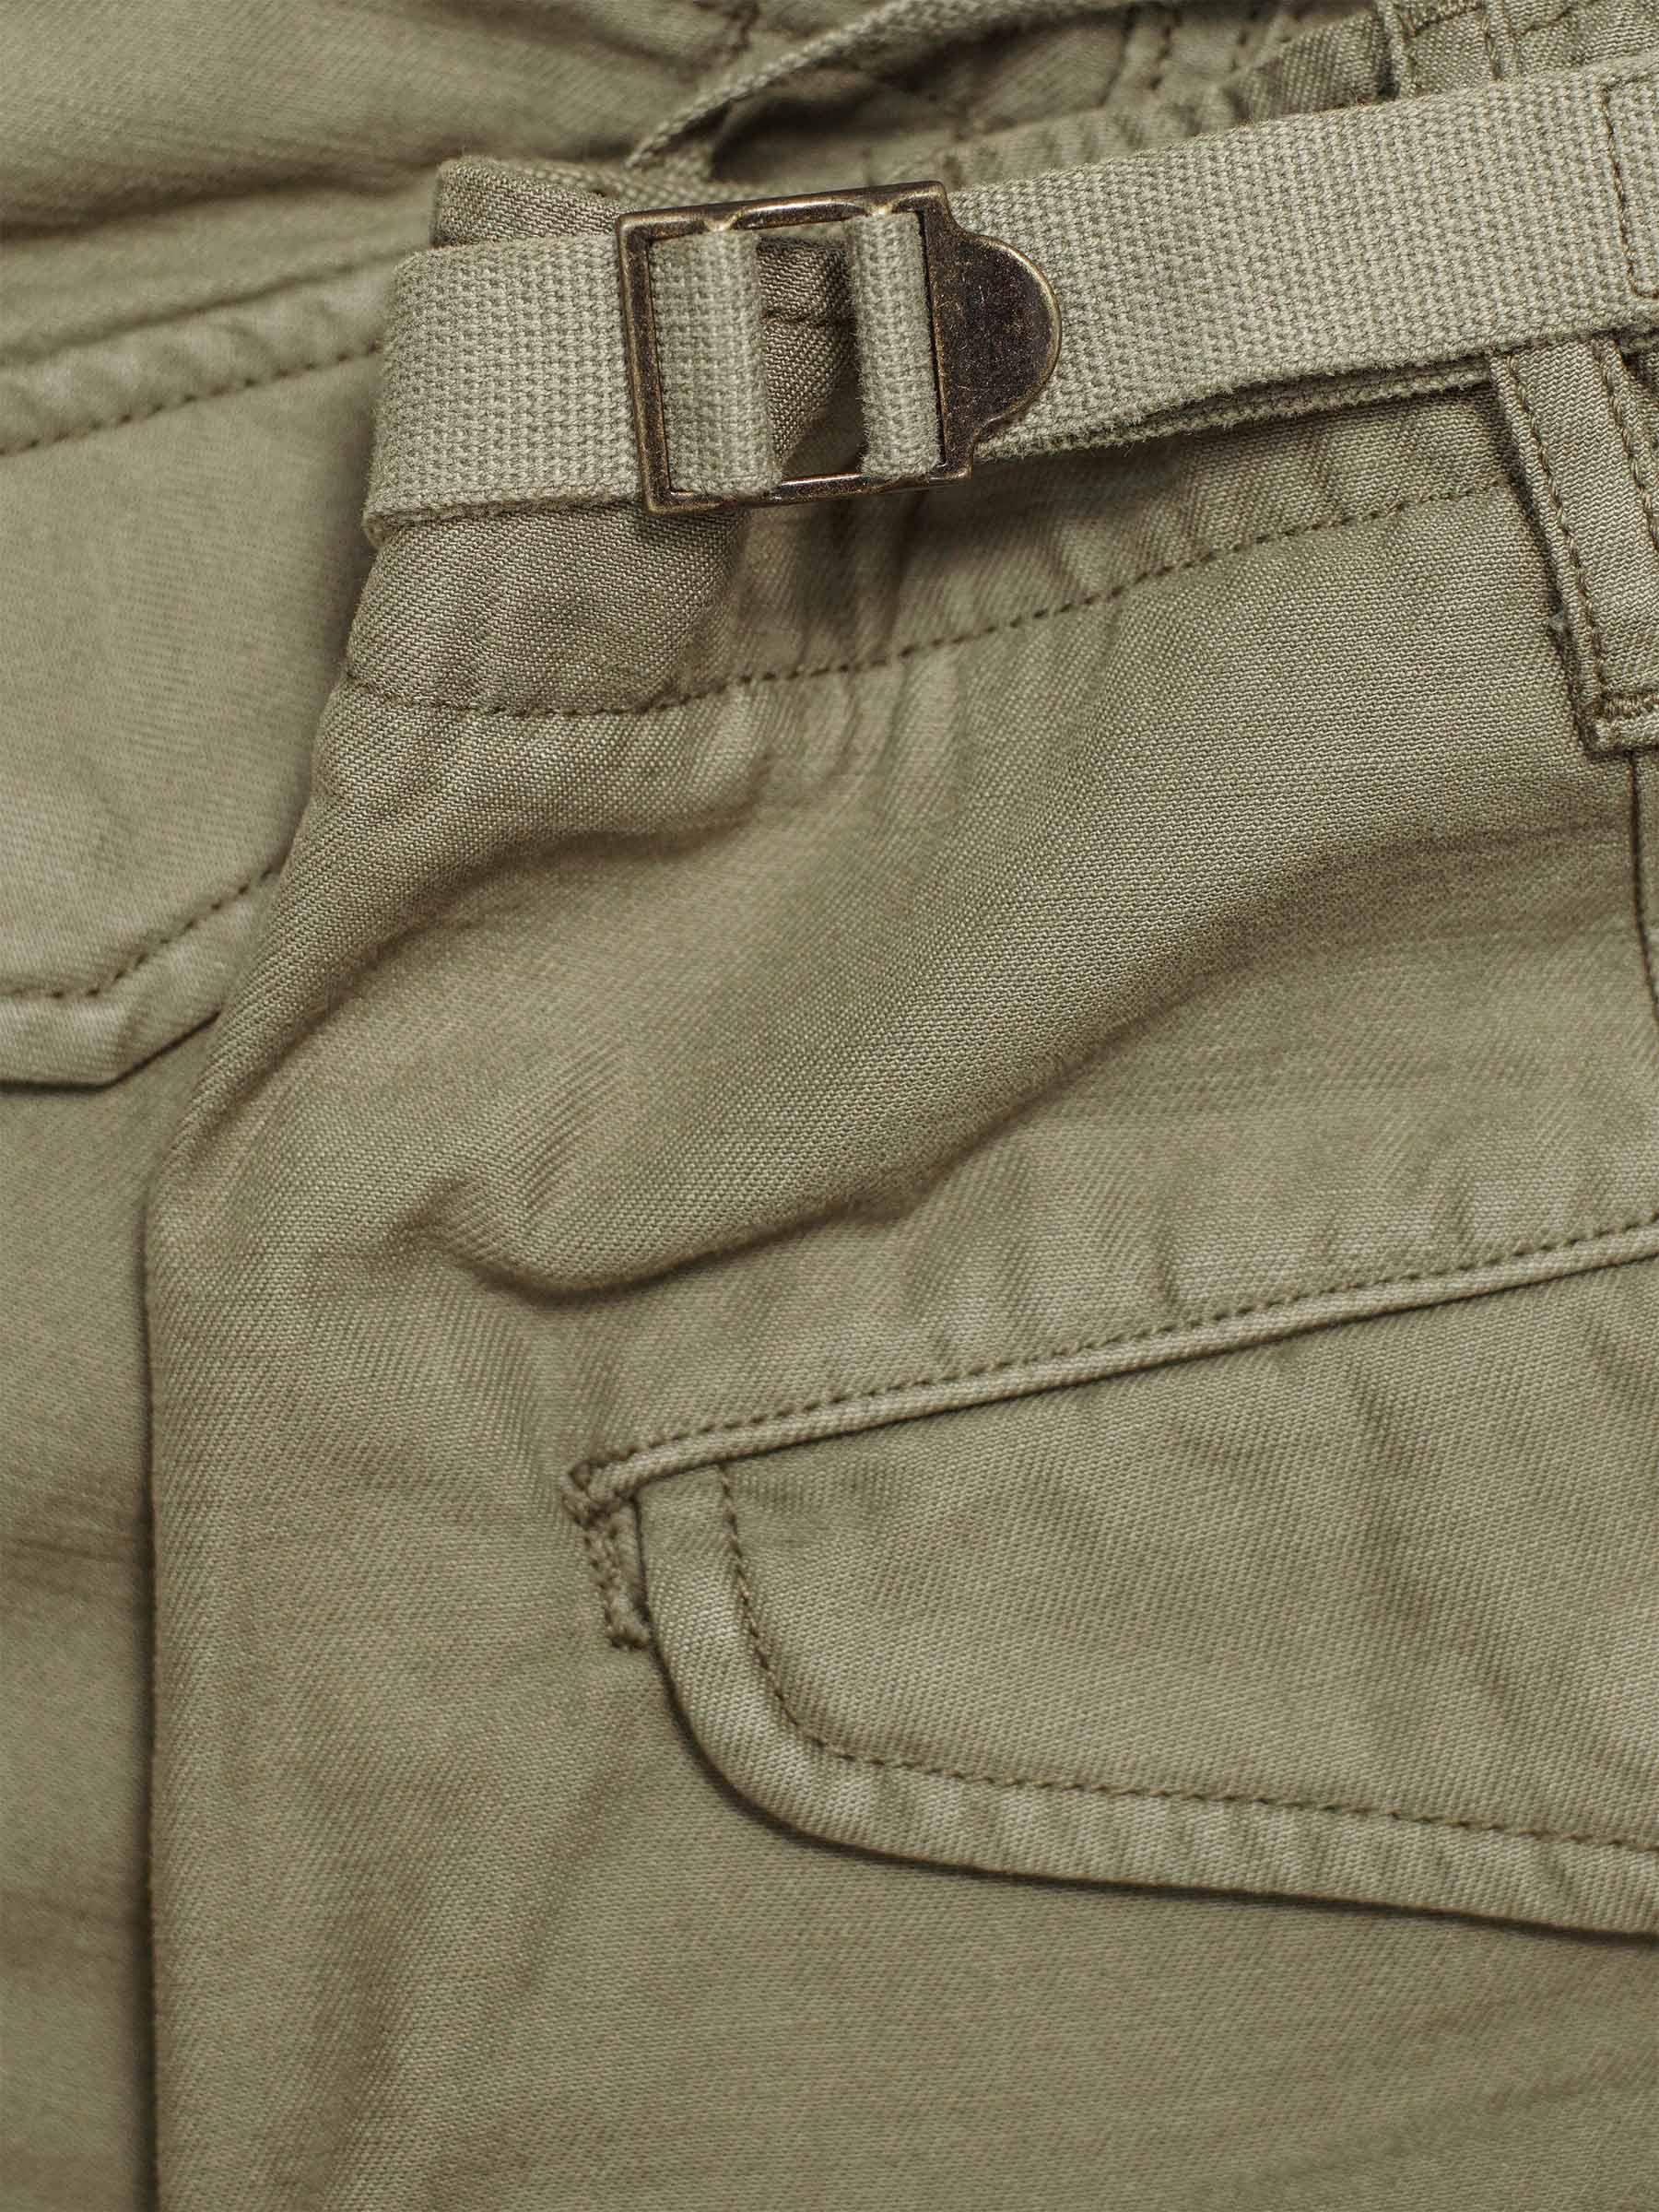 Buck Mason - Black Stone Twill Desert Cargo Pant